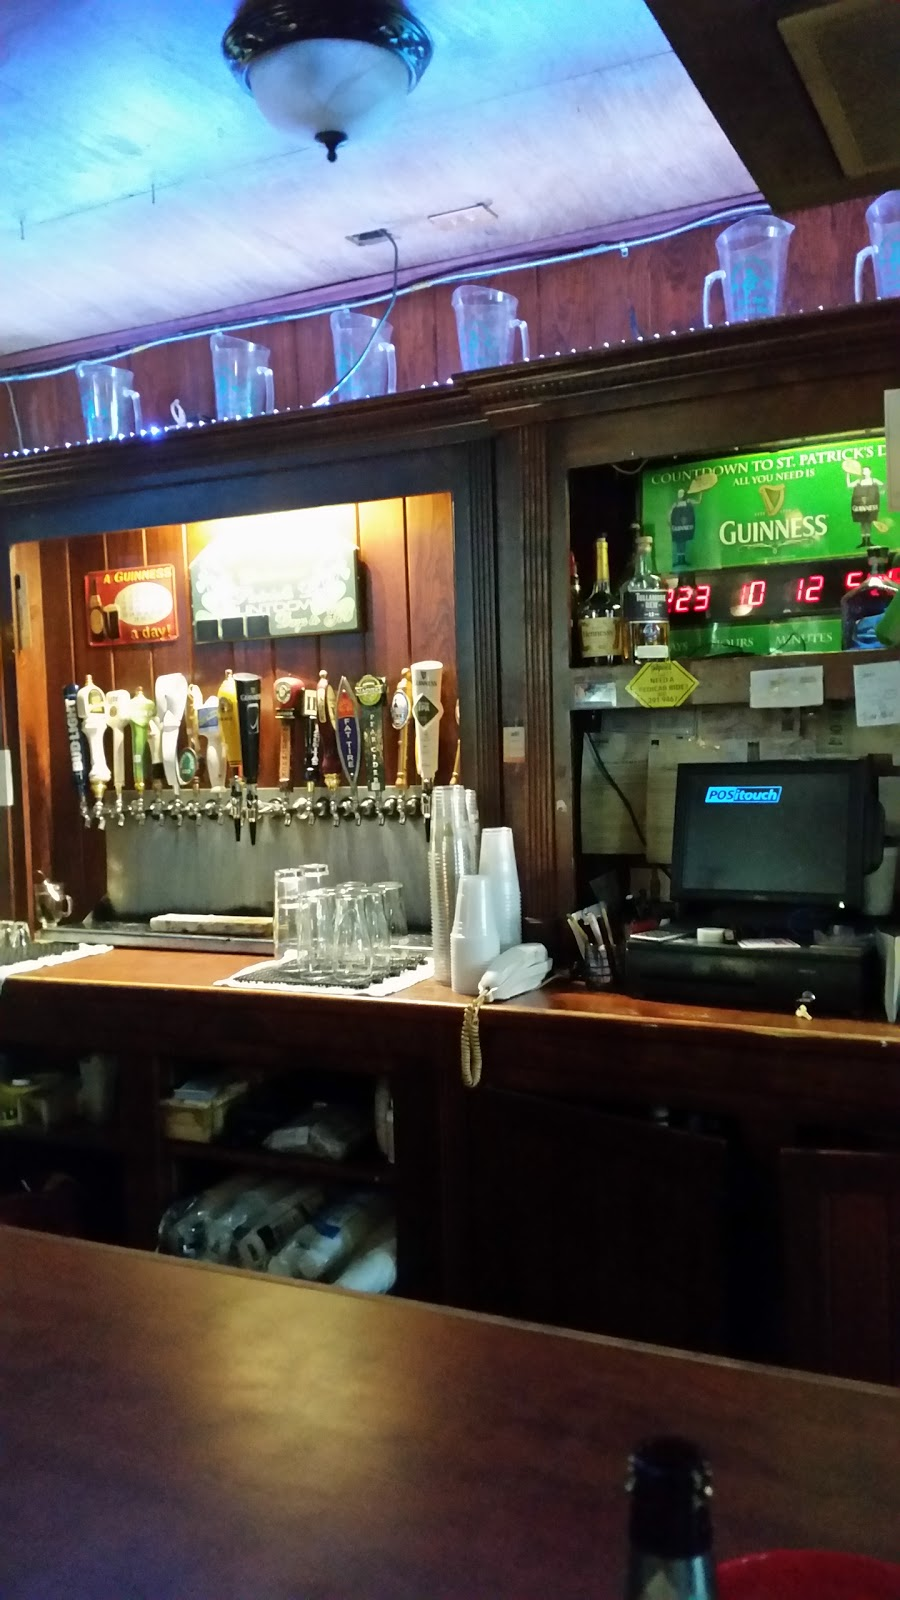 Paddy OLearys Irish Pub | restaurant | 49 Via De Luna Dr, Pensacola Beach, FL 32561, USA | 8509169808 OR +1 850-916-9808